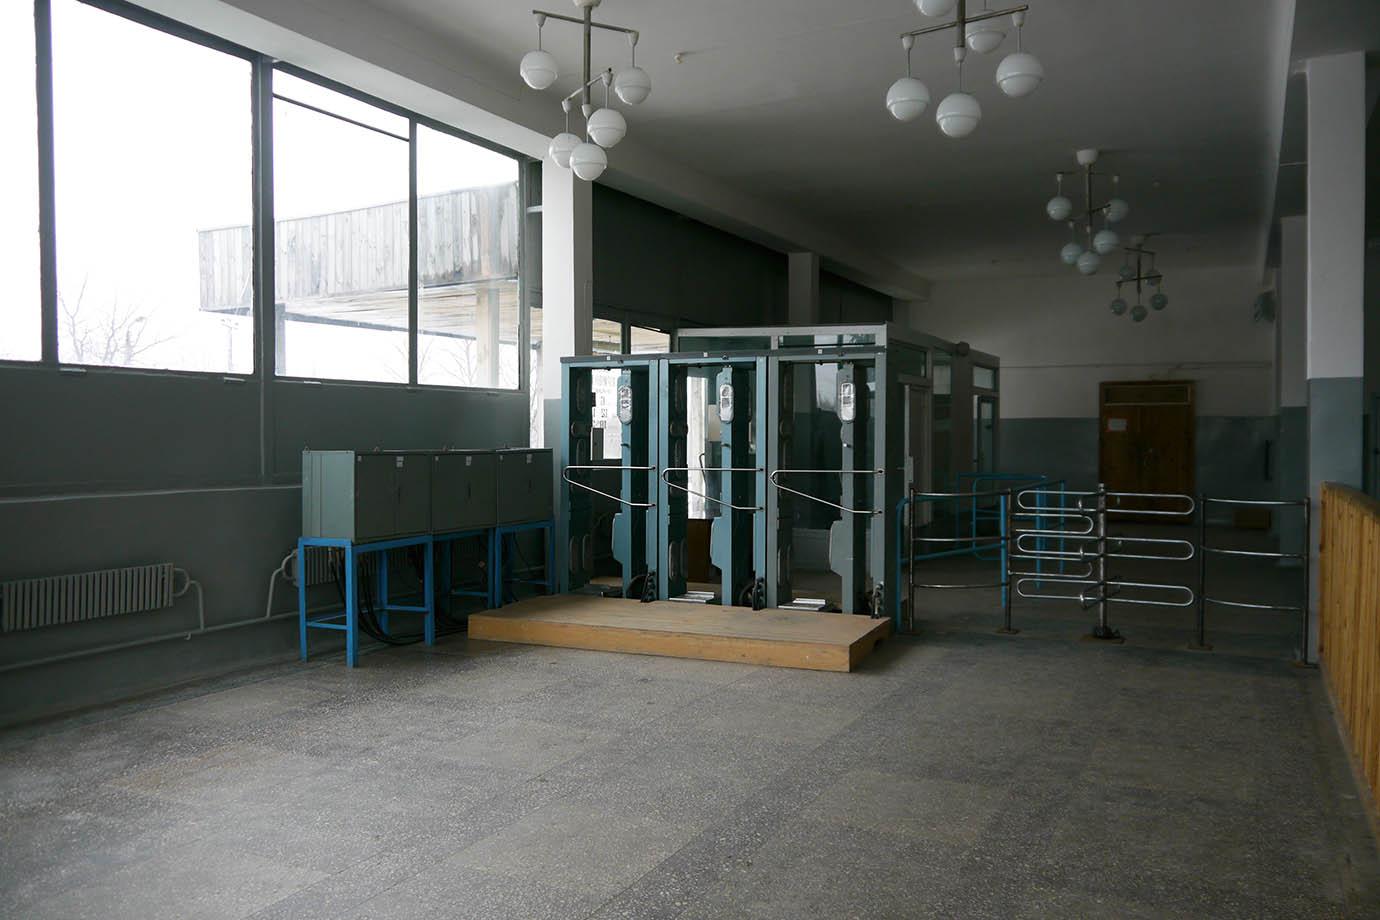 chernobyl-cafeteria44